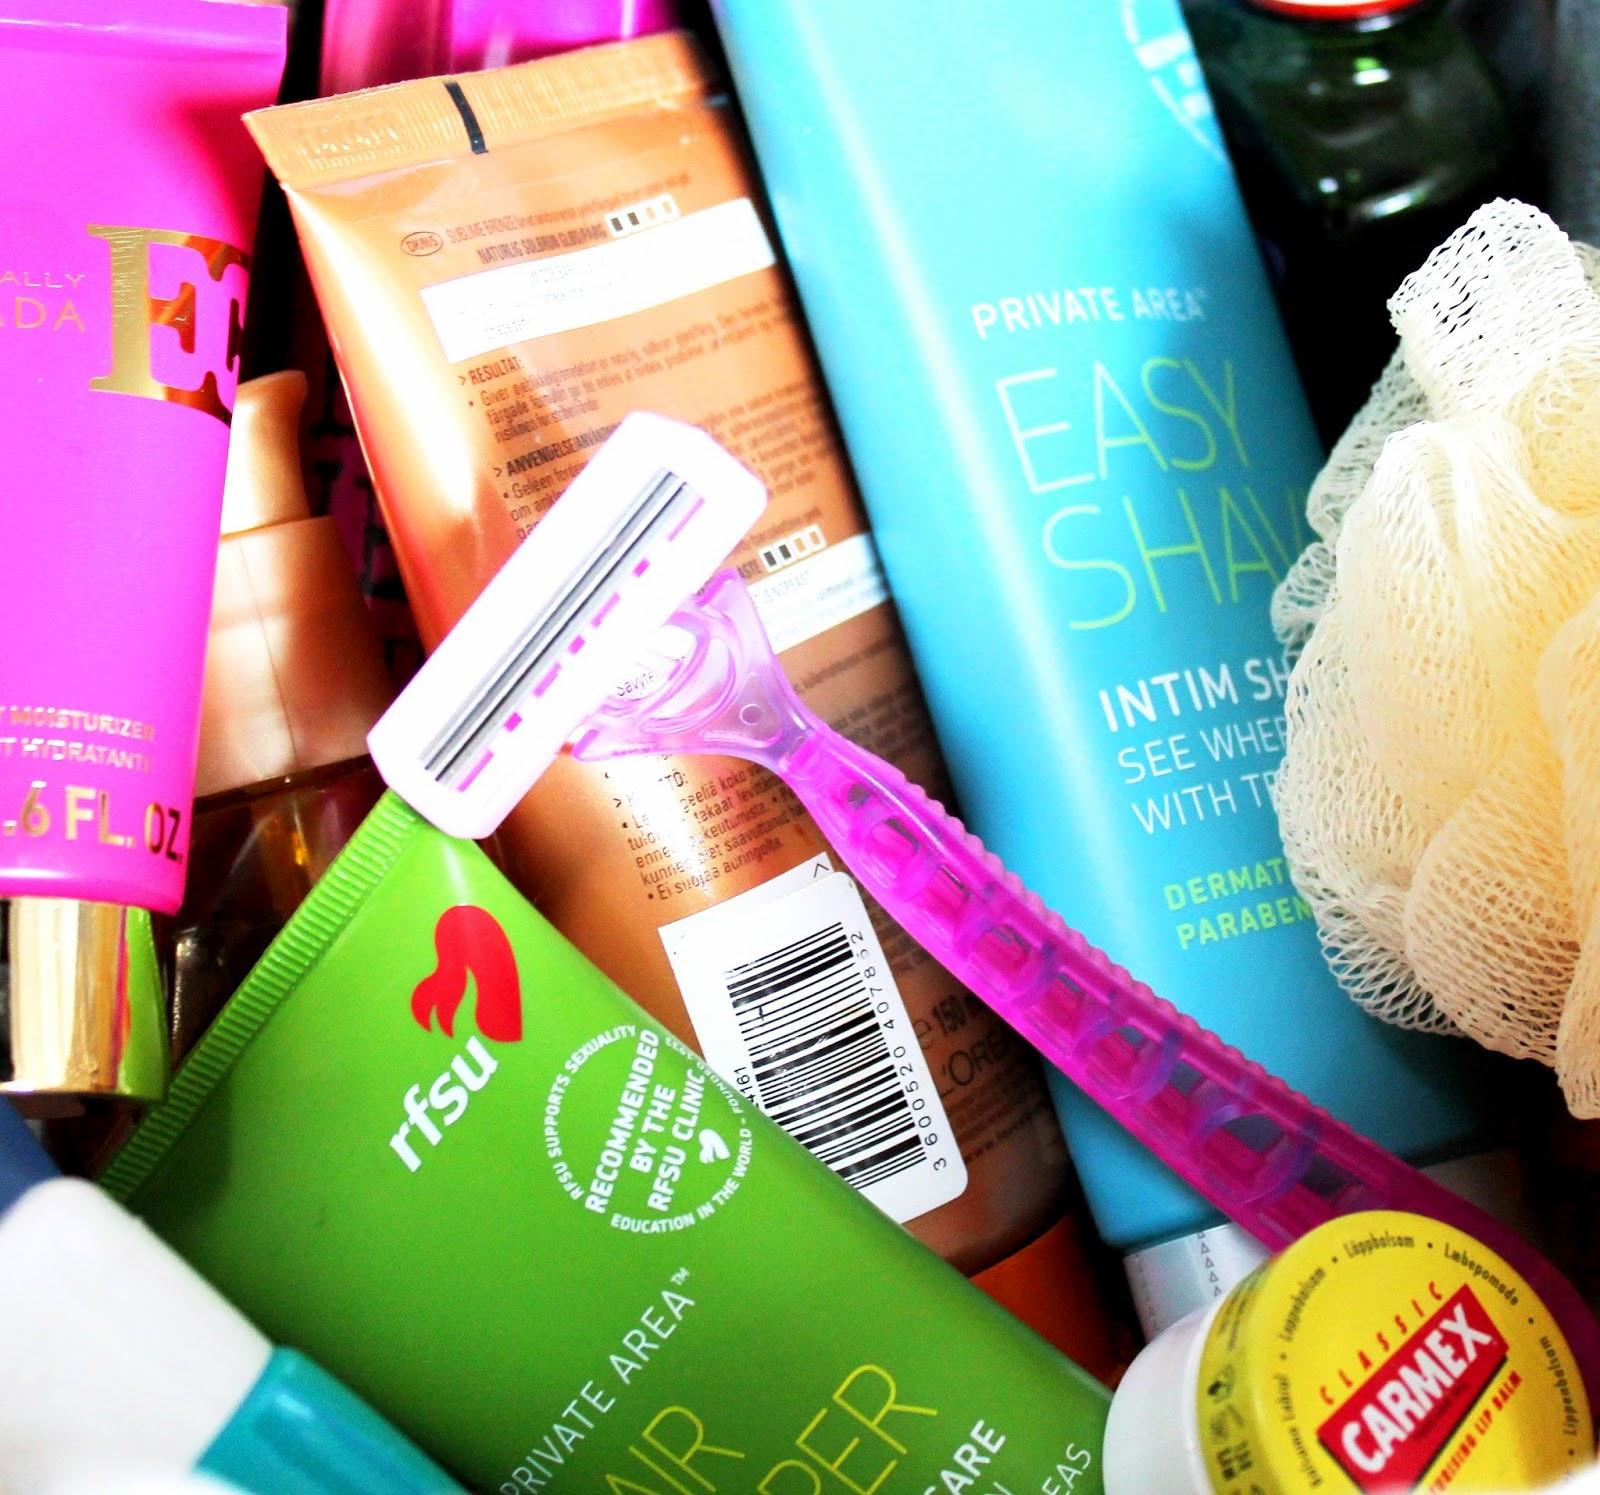 RFSU and Carmex testing. Cosmetics | Alinan kotona blog